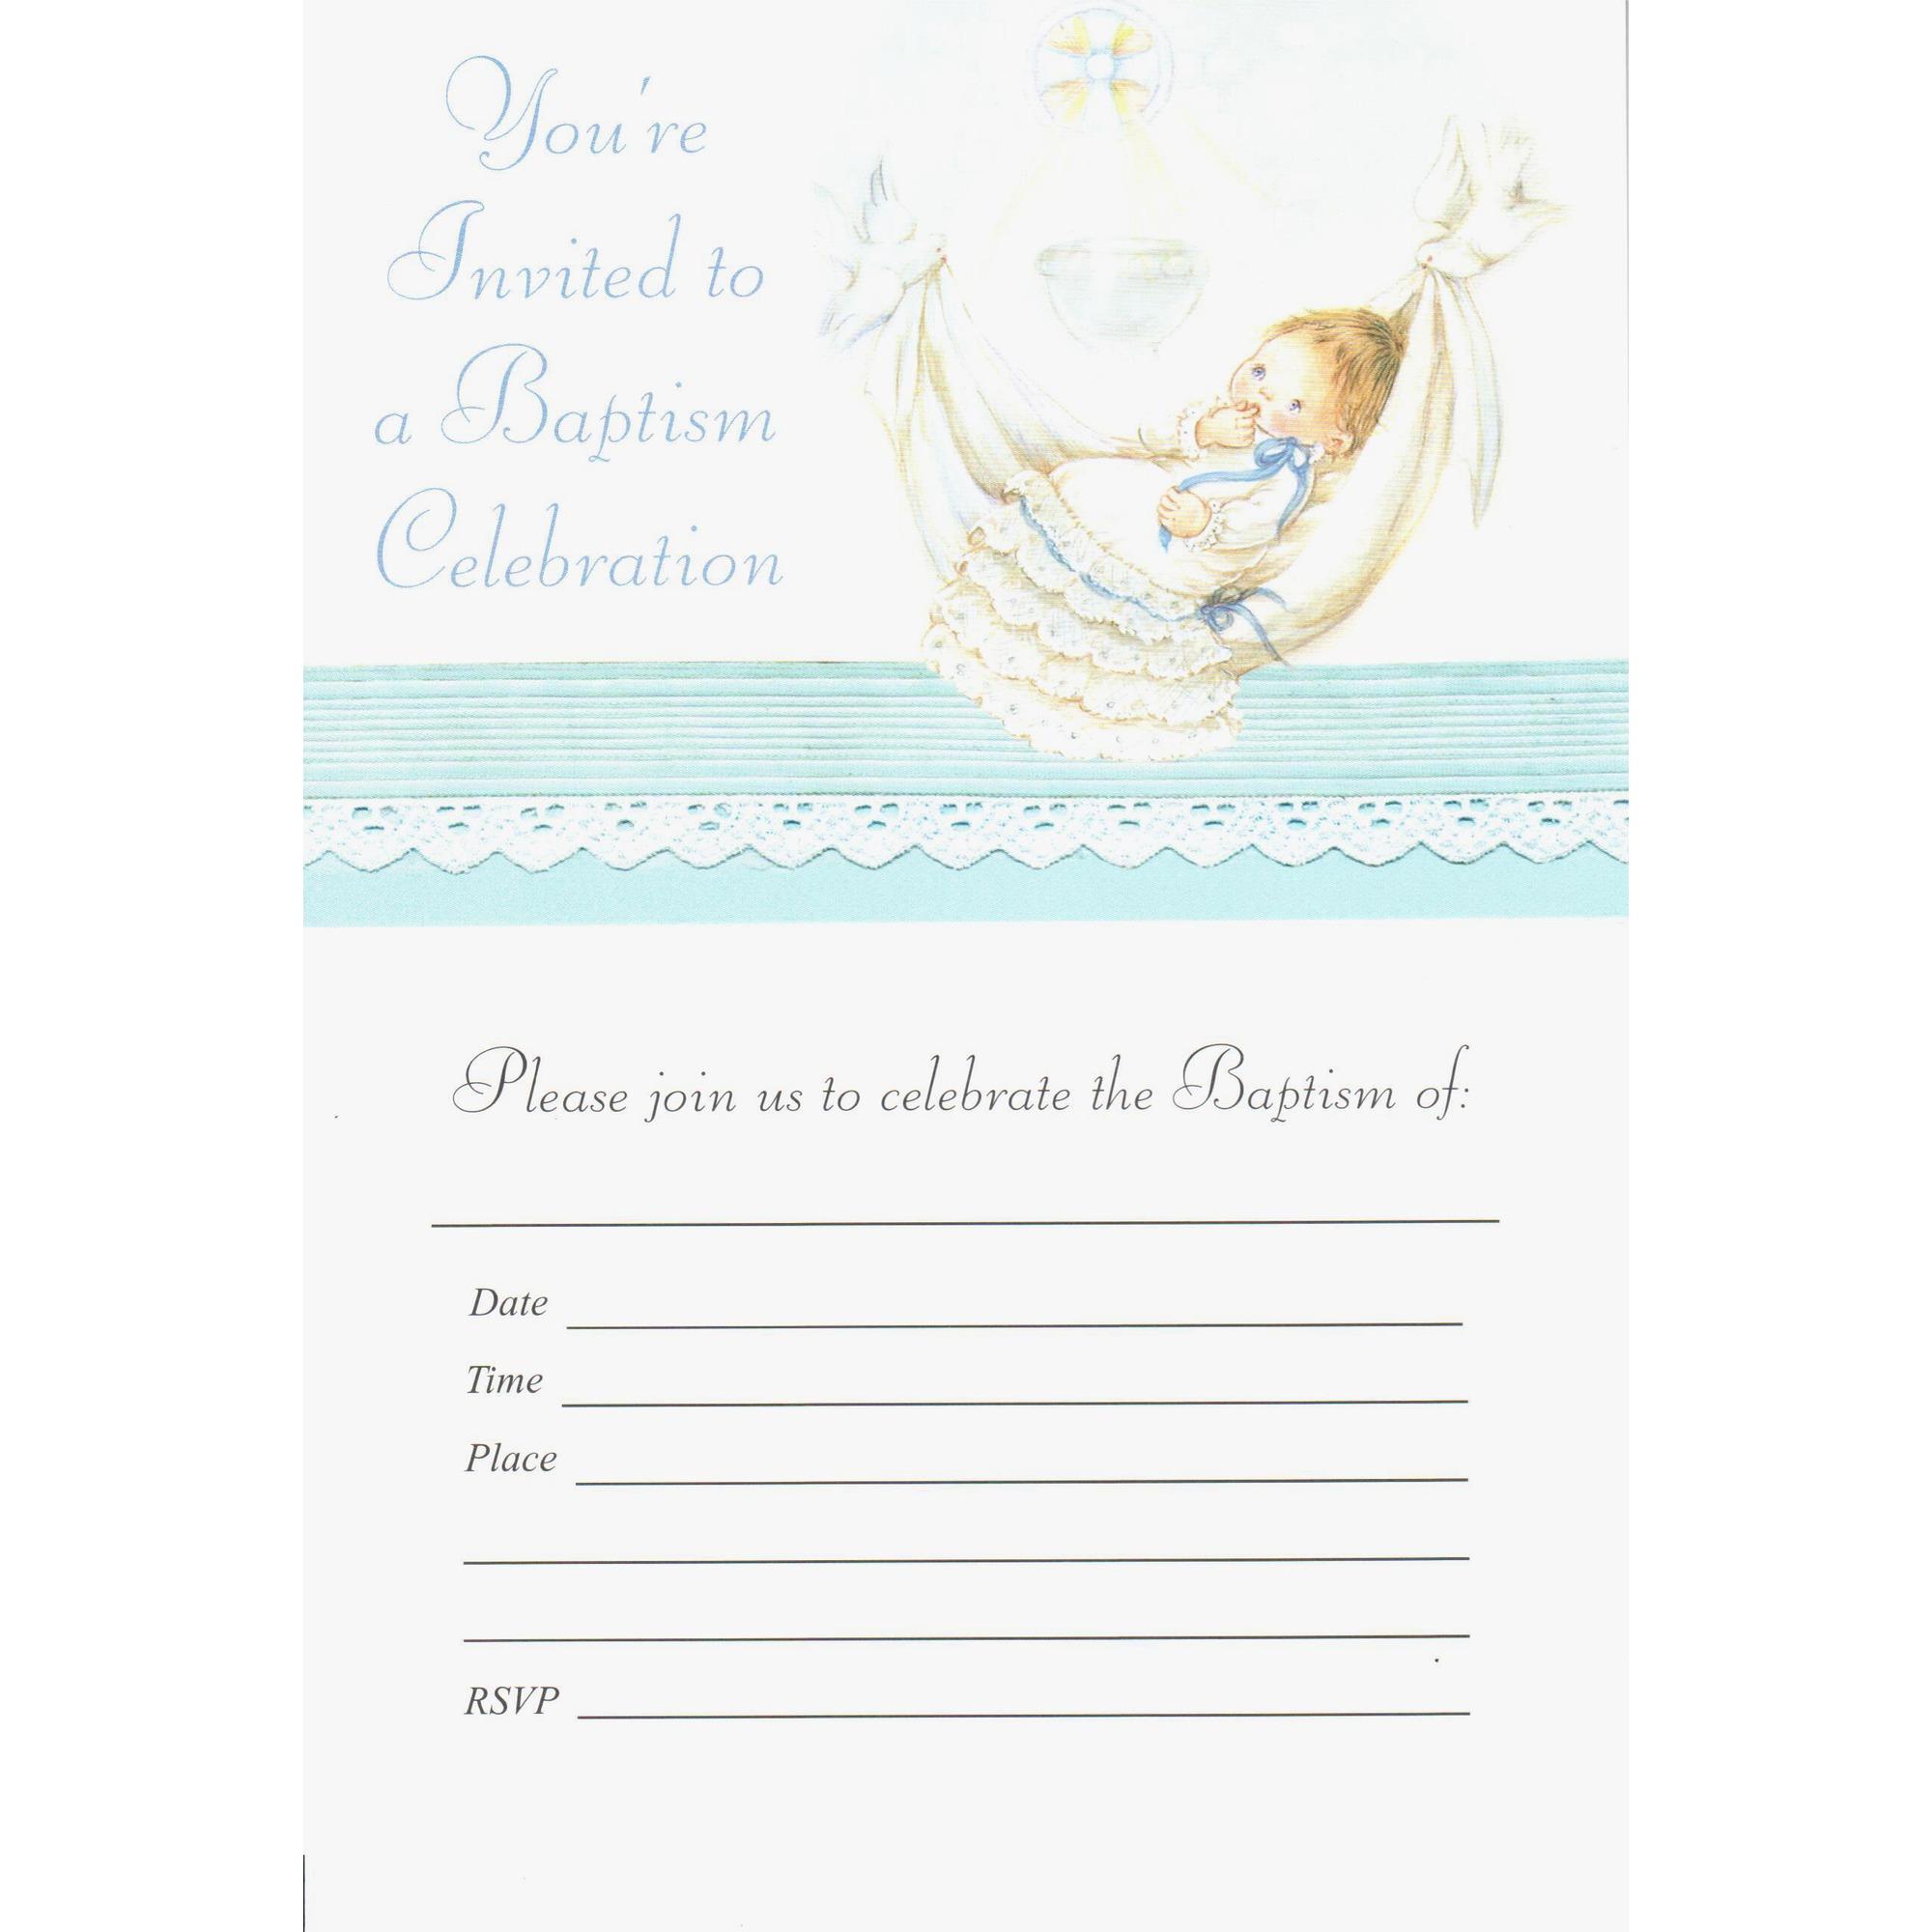 Baptism Invitation - Boy | The Catholic Company